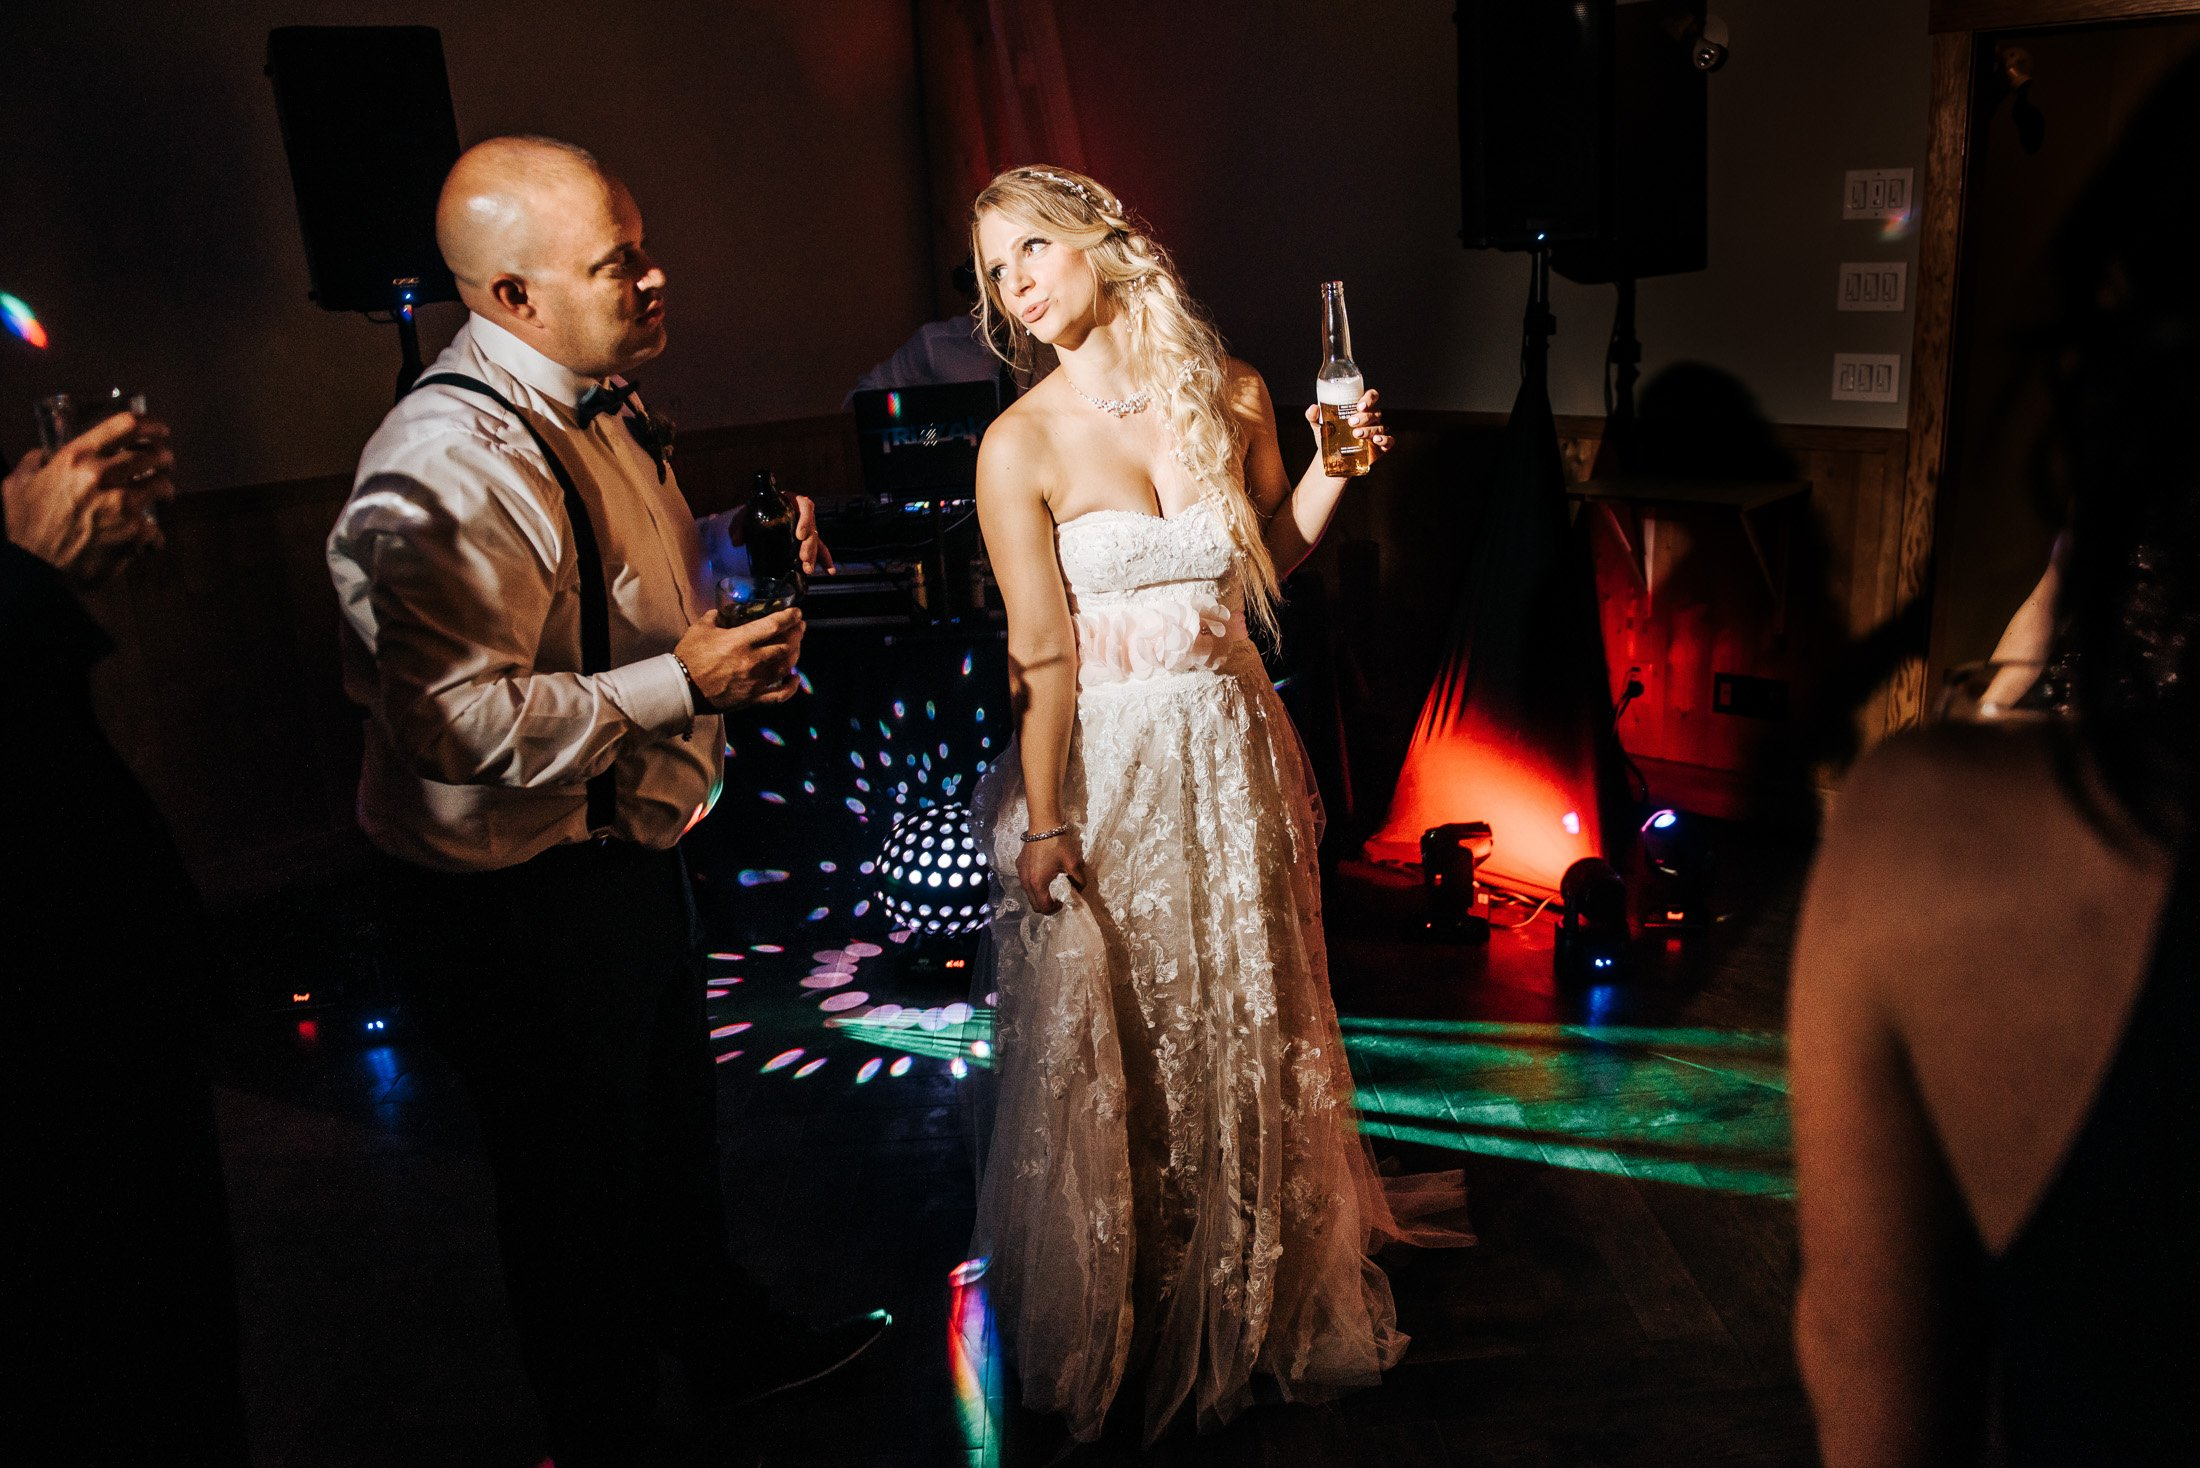 019 bride dance wedding photography